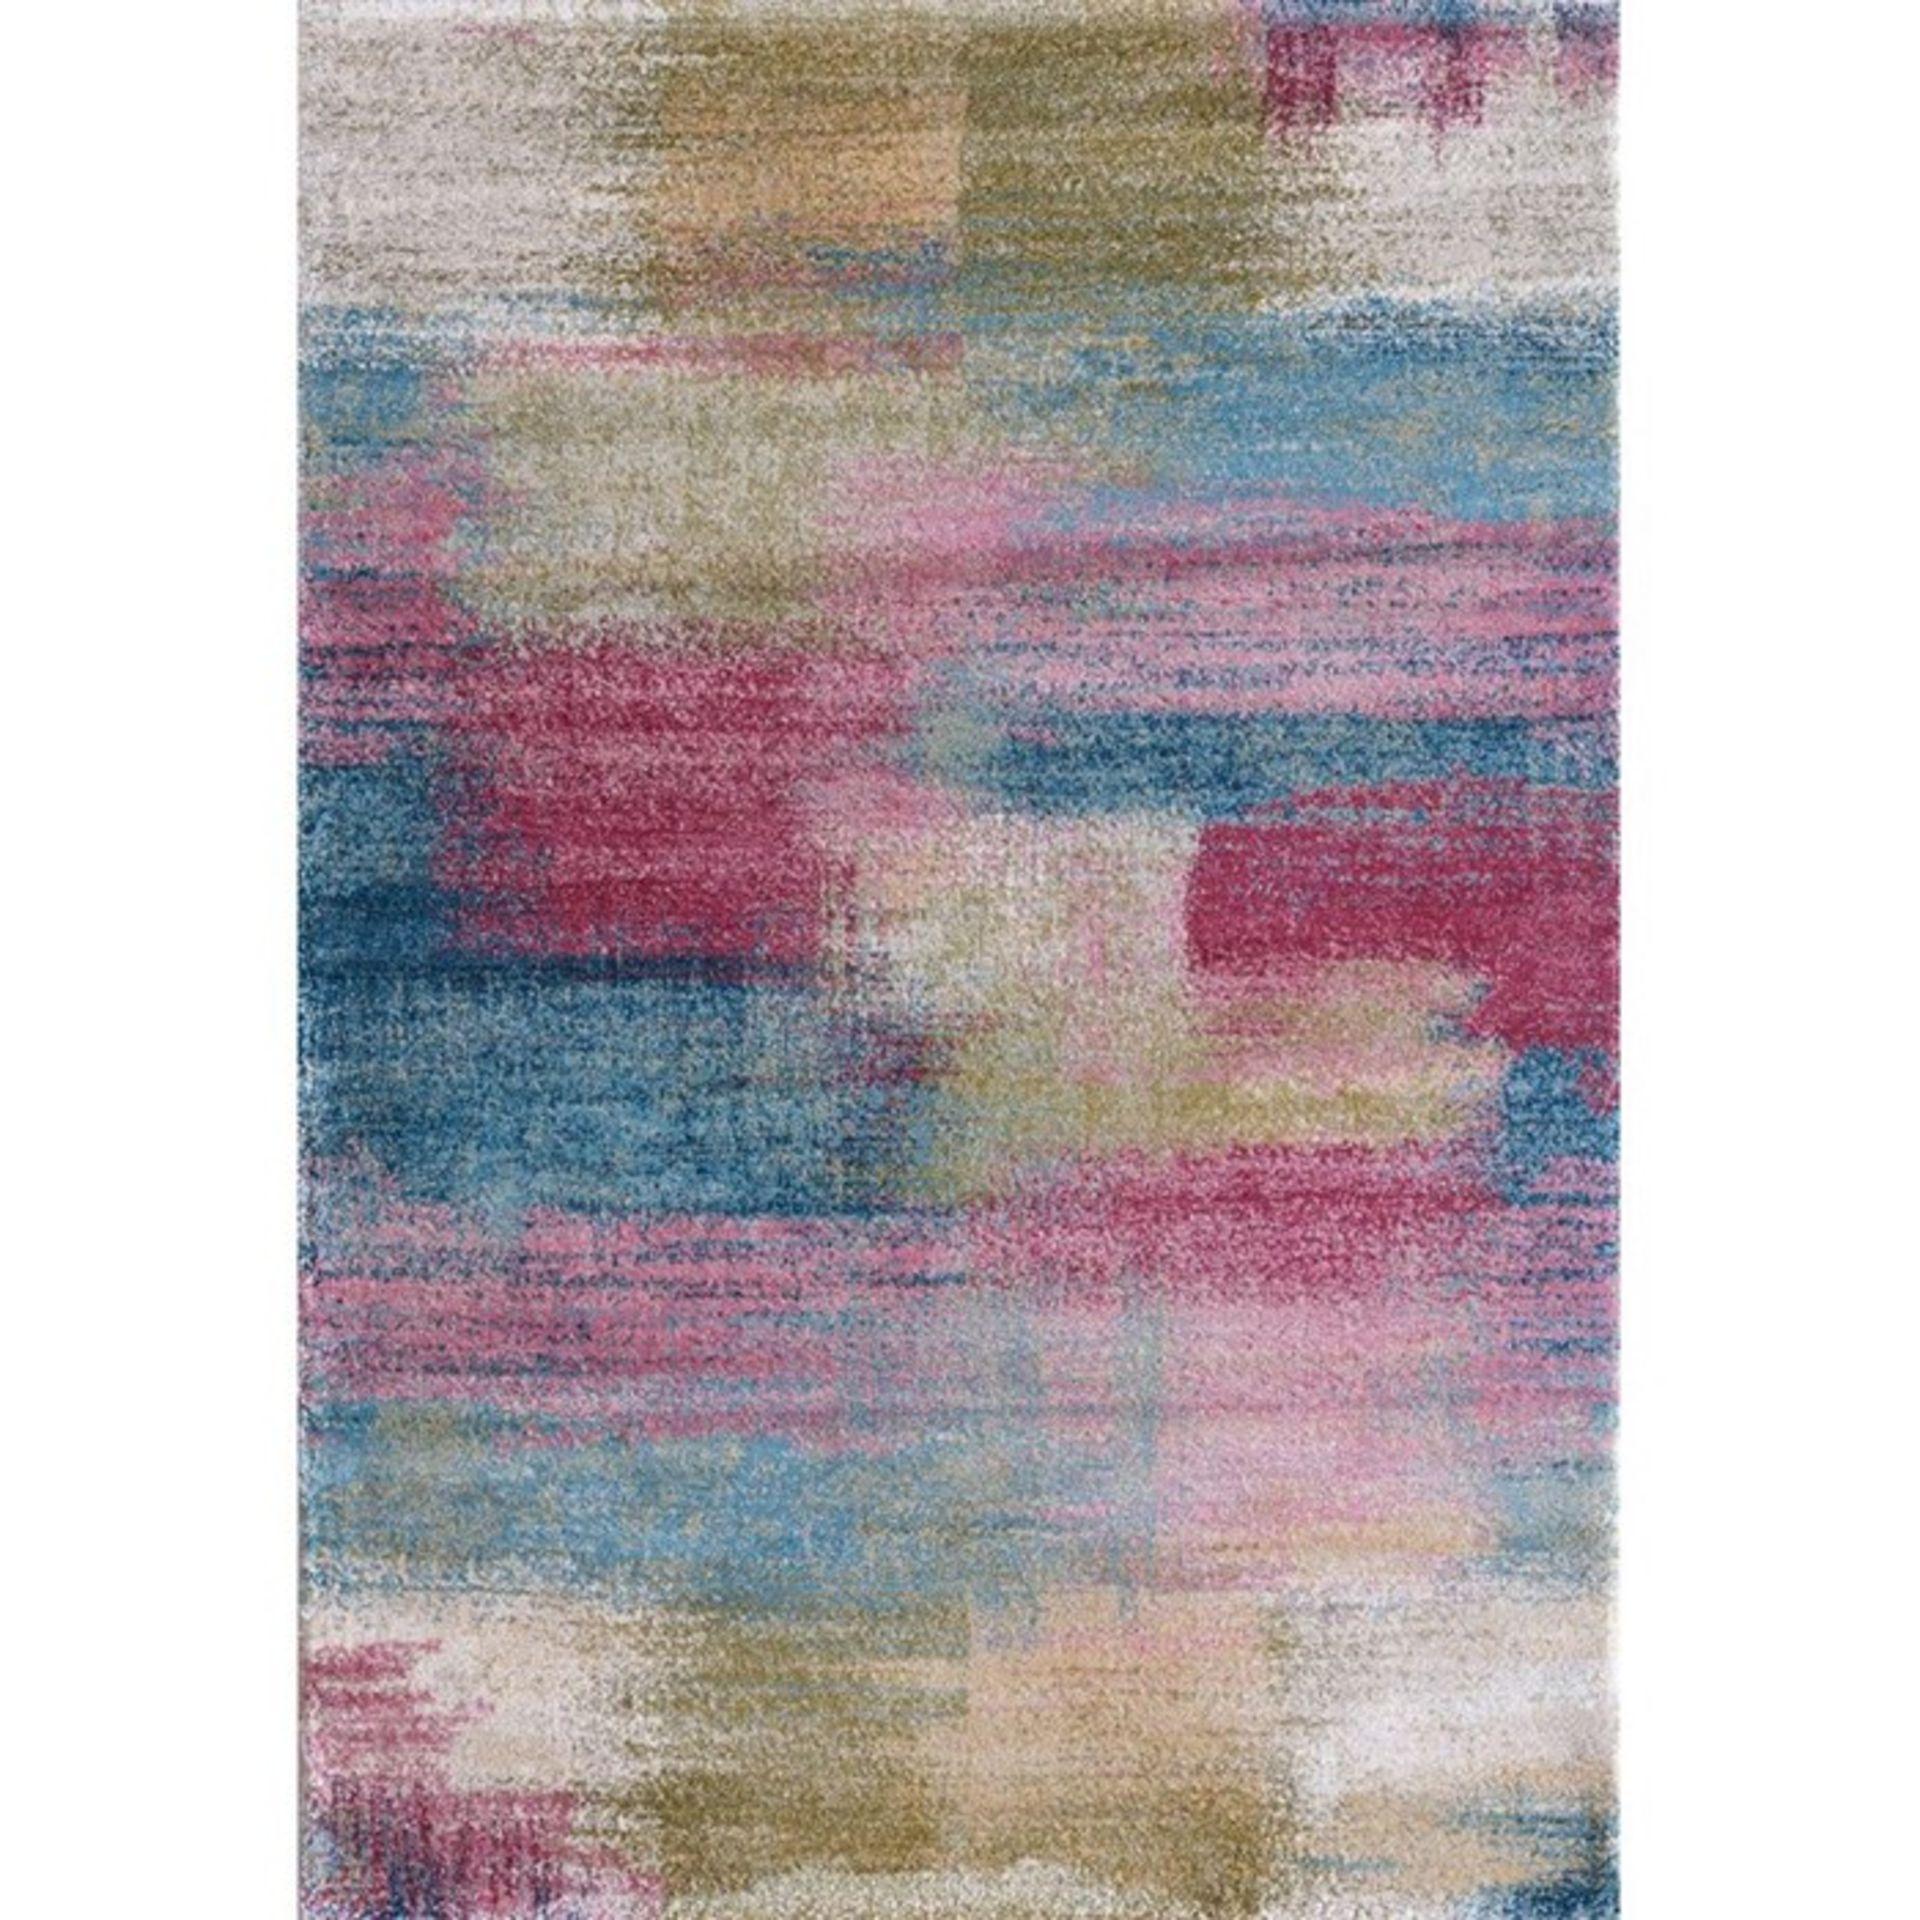 Latitude Vive,Emmett Pink/Blue Rug RRP -£212.99 (WLDJ7431.25794972 -H15948 - 2/14)